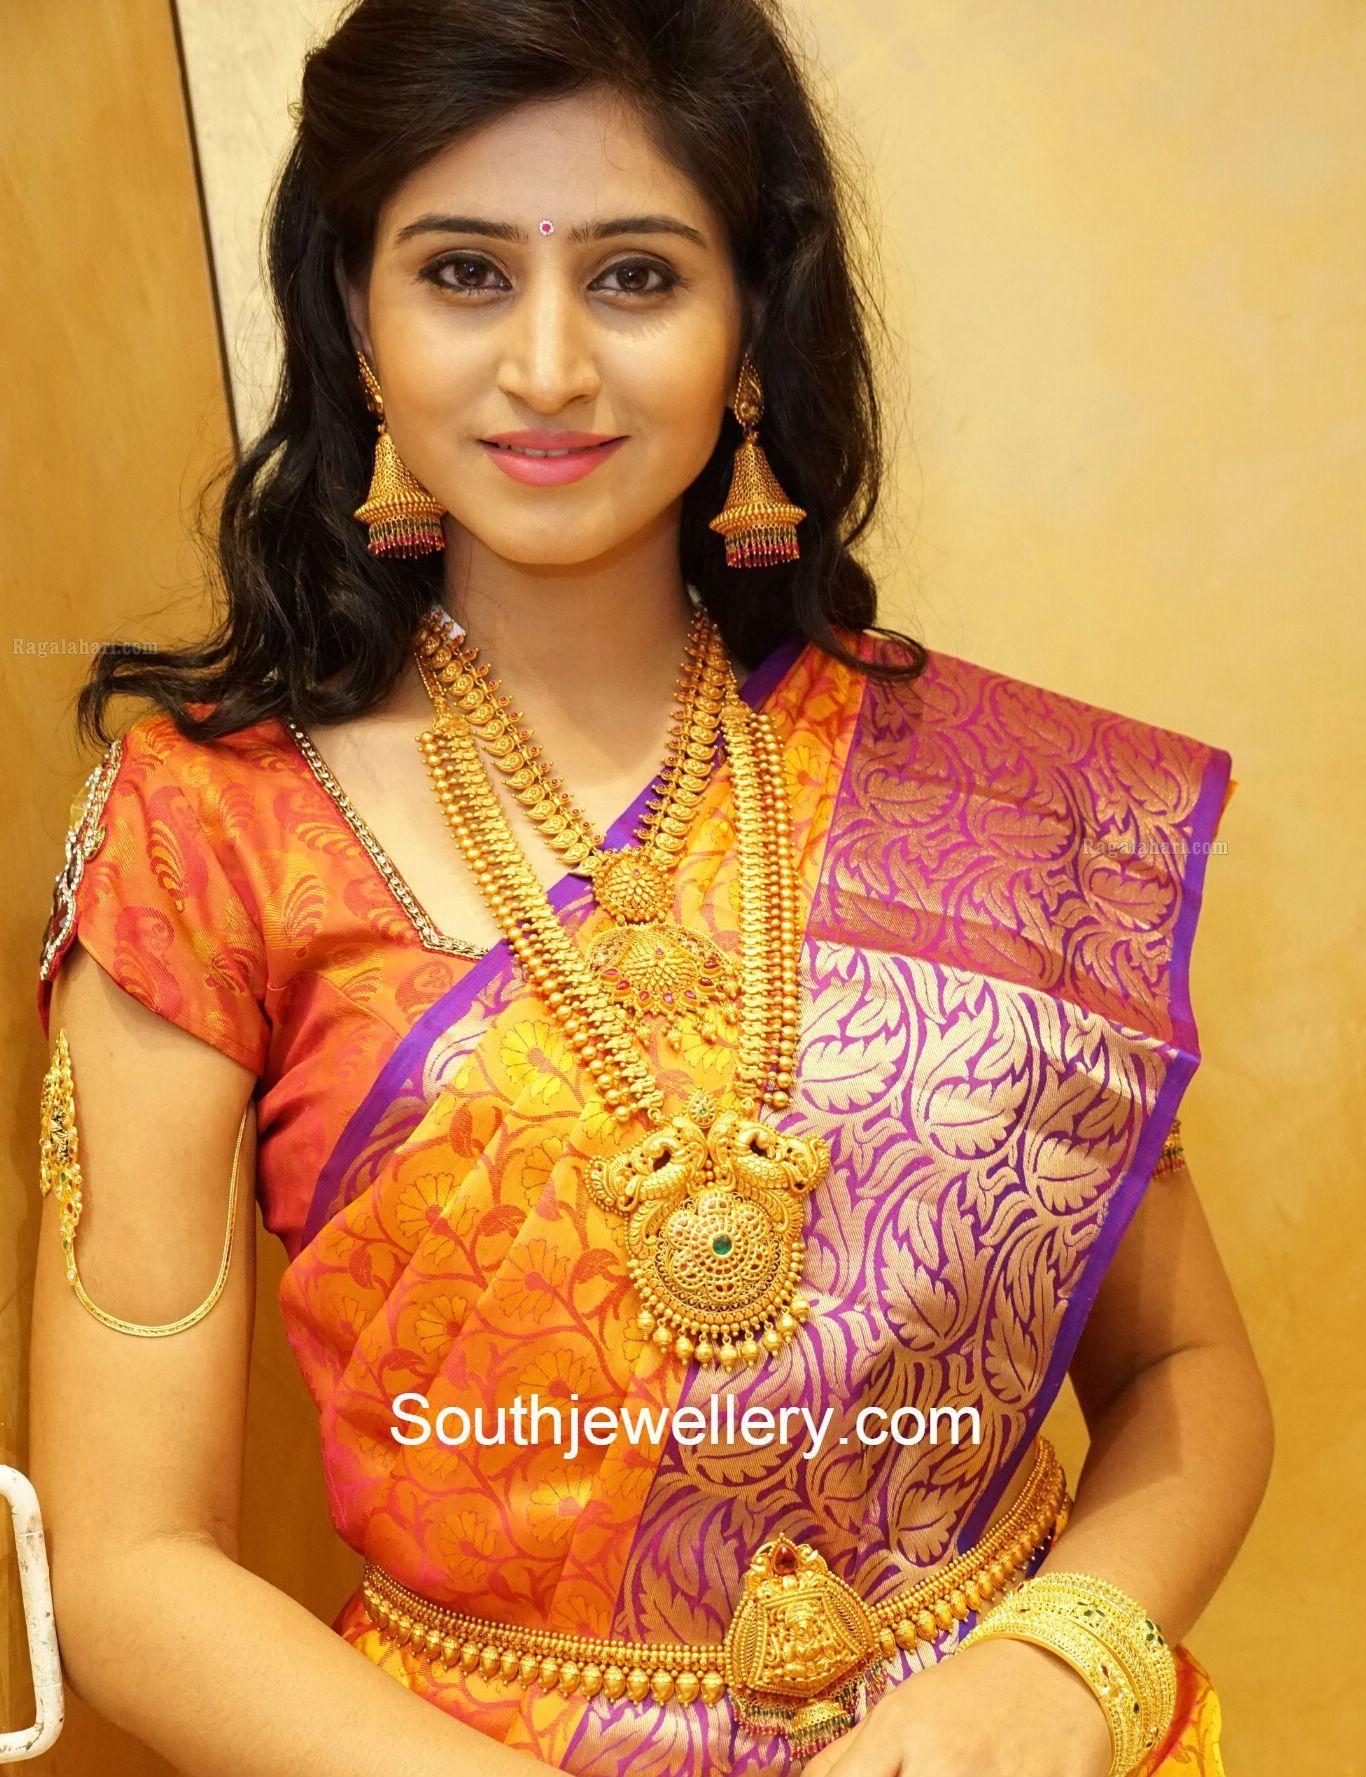 shamilimangoharamjpg 13661777 Long Gold Chains Pinterest